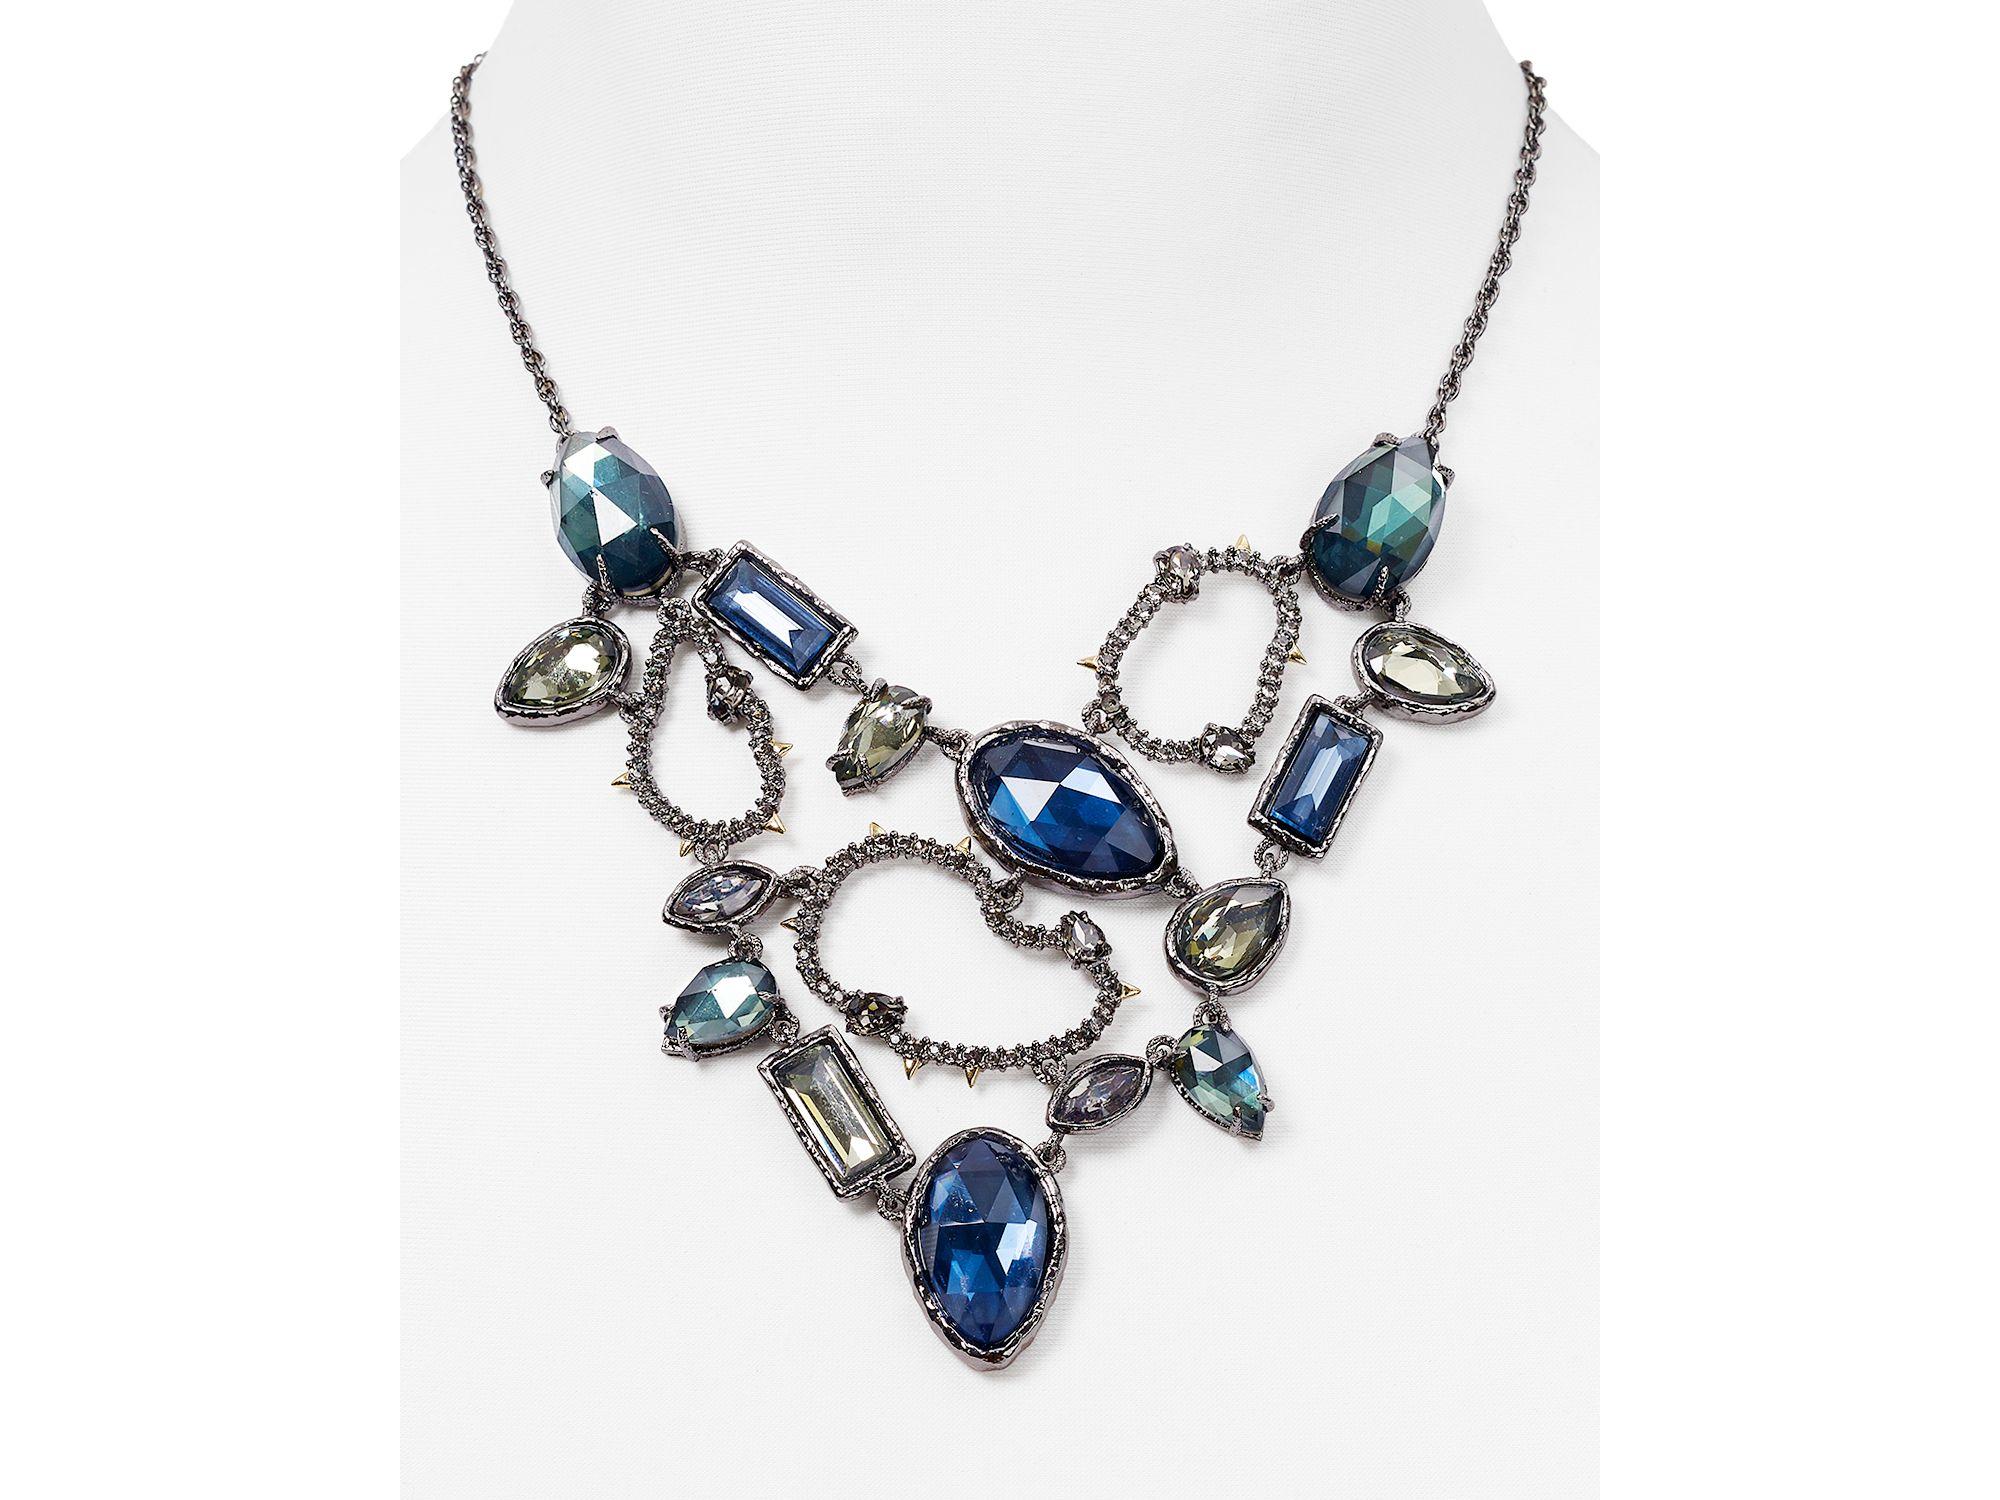 f2ebcbb8f7977 Alexis Bittar Black Elements Confetti Link Swarovski Crystal Bib Necklace,  16